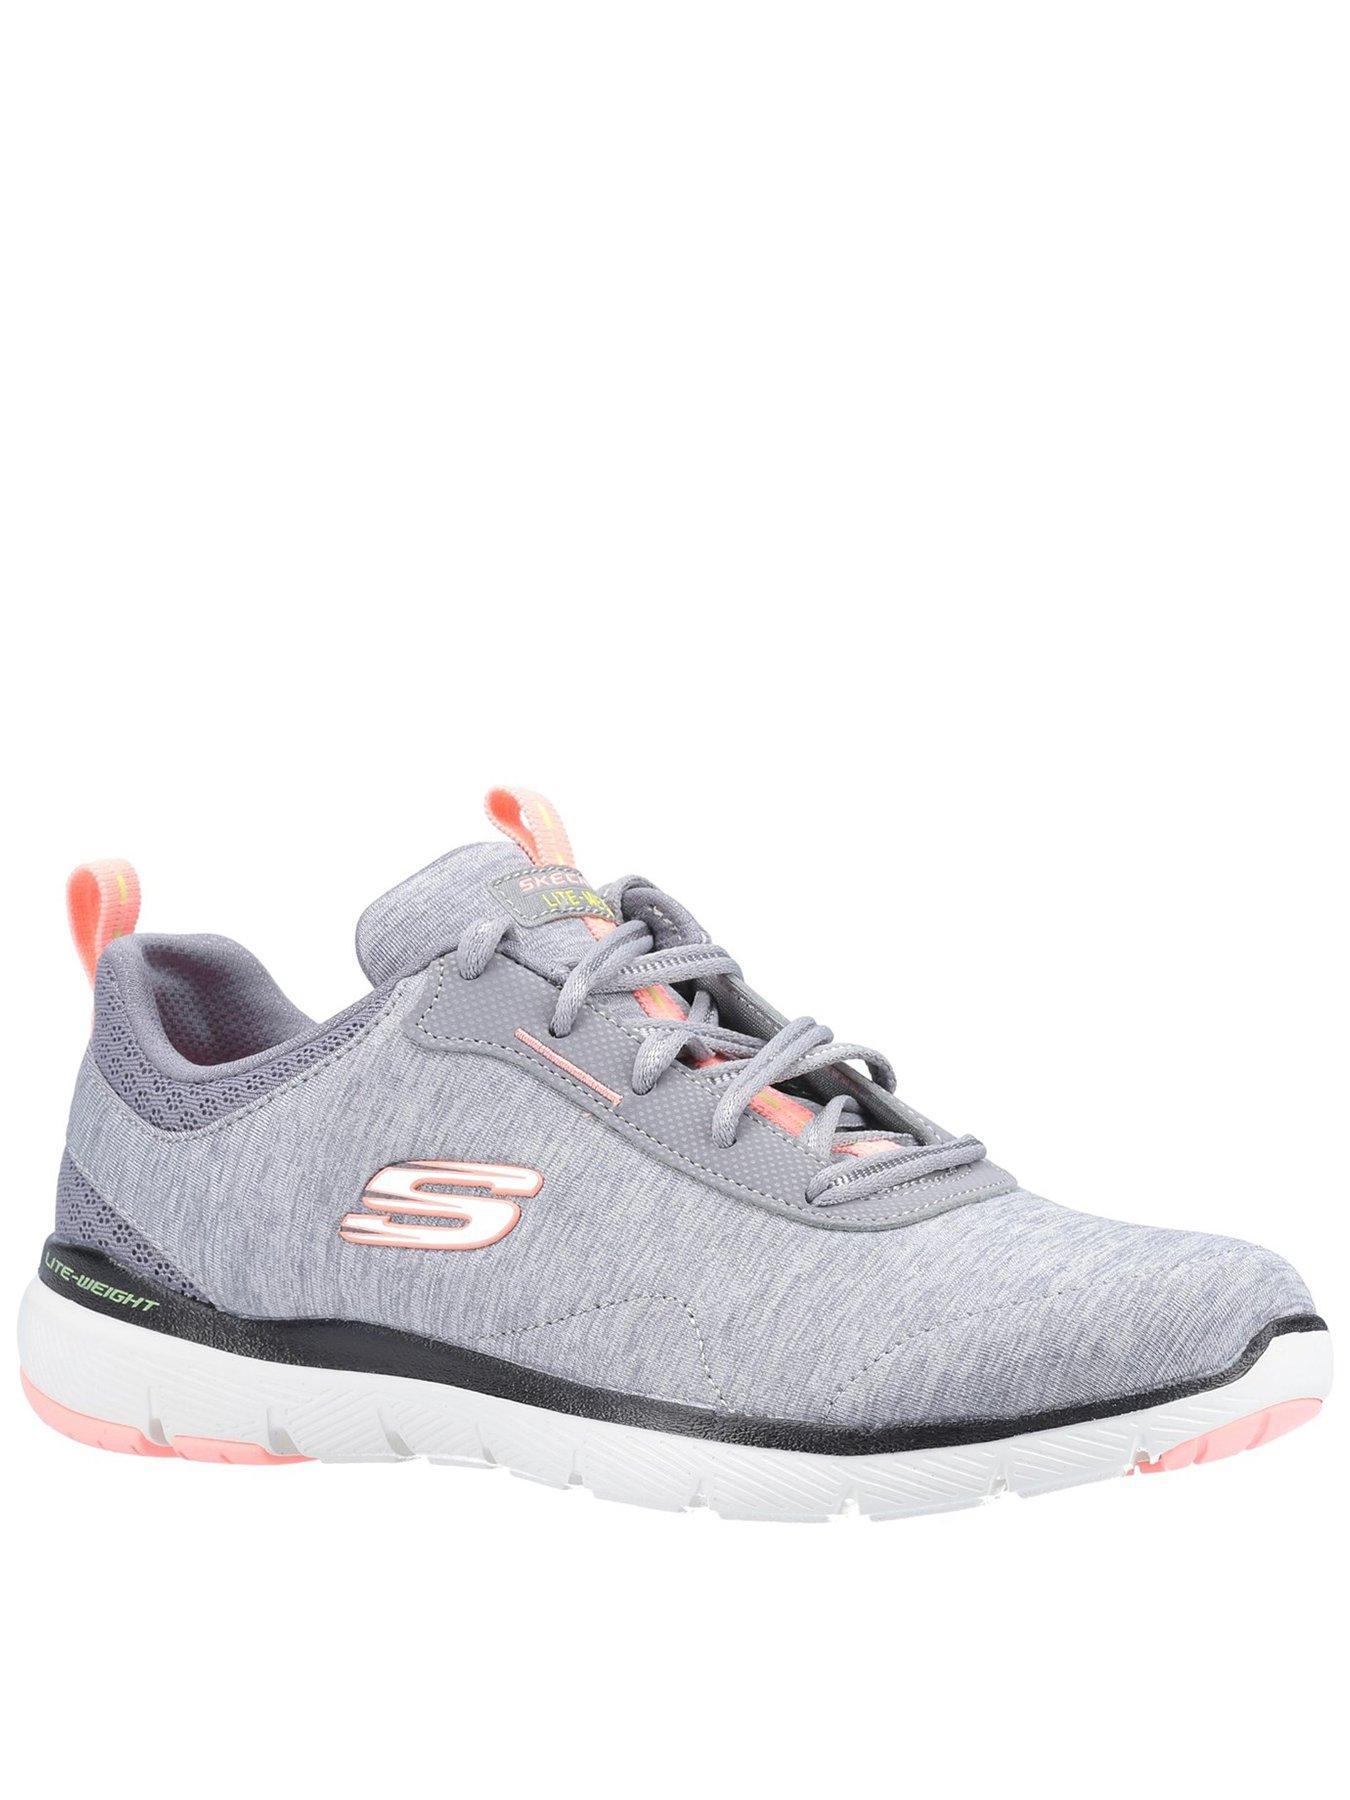 Skechers Shoes \u0026 Trainers   Women \u0026 Men